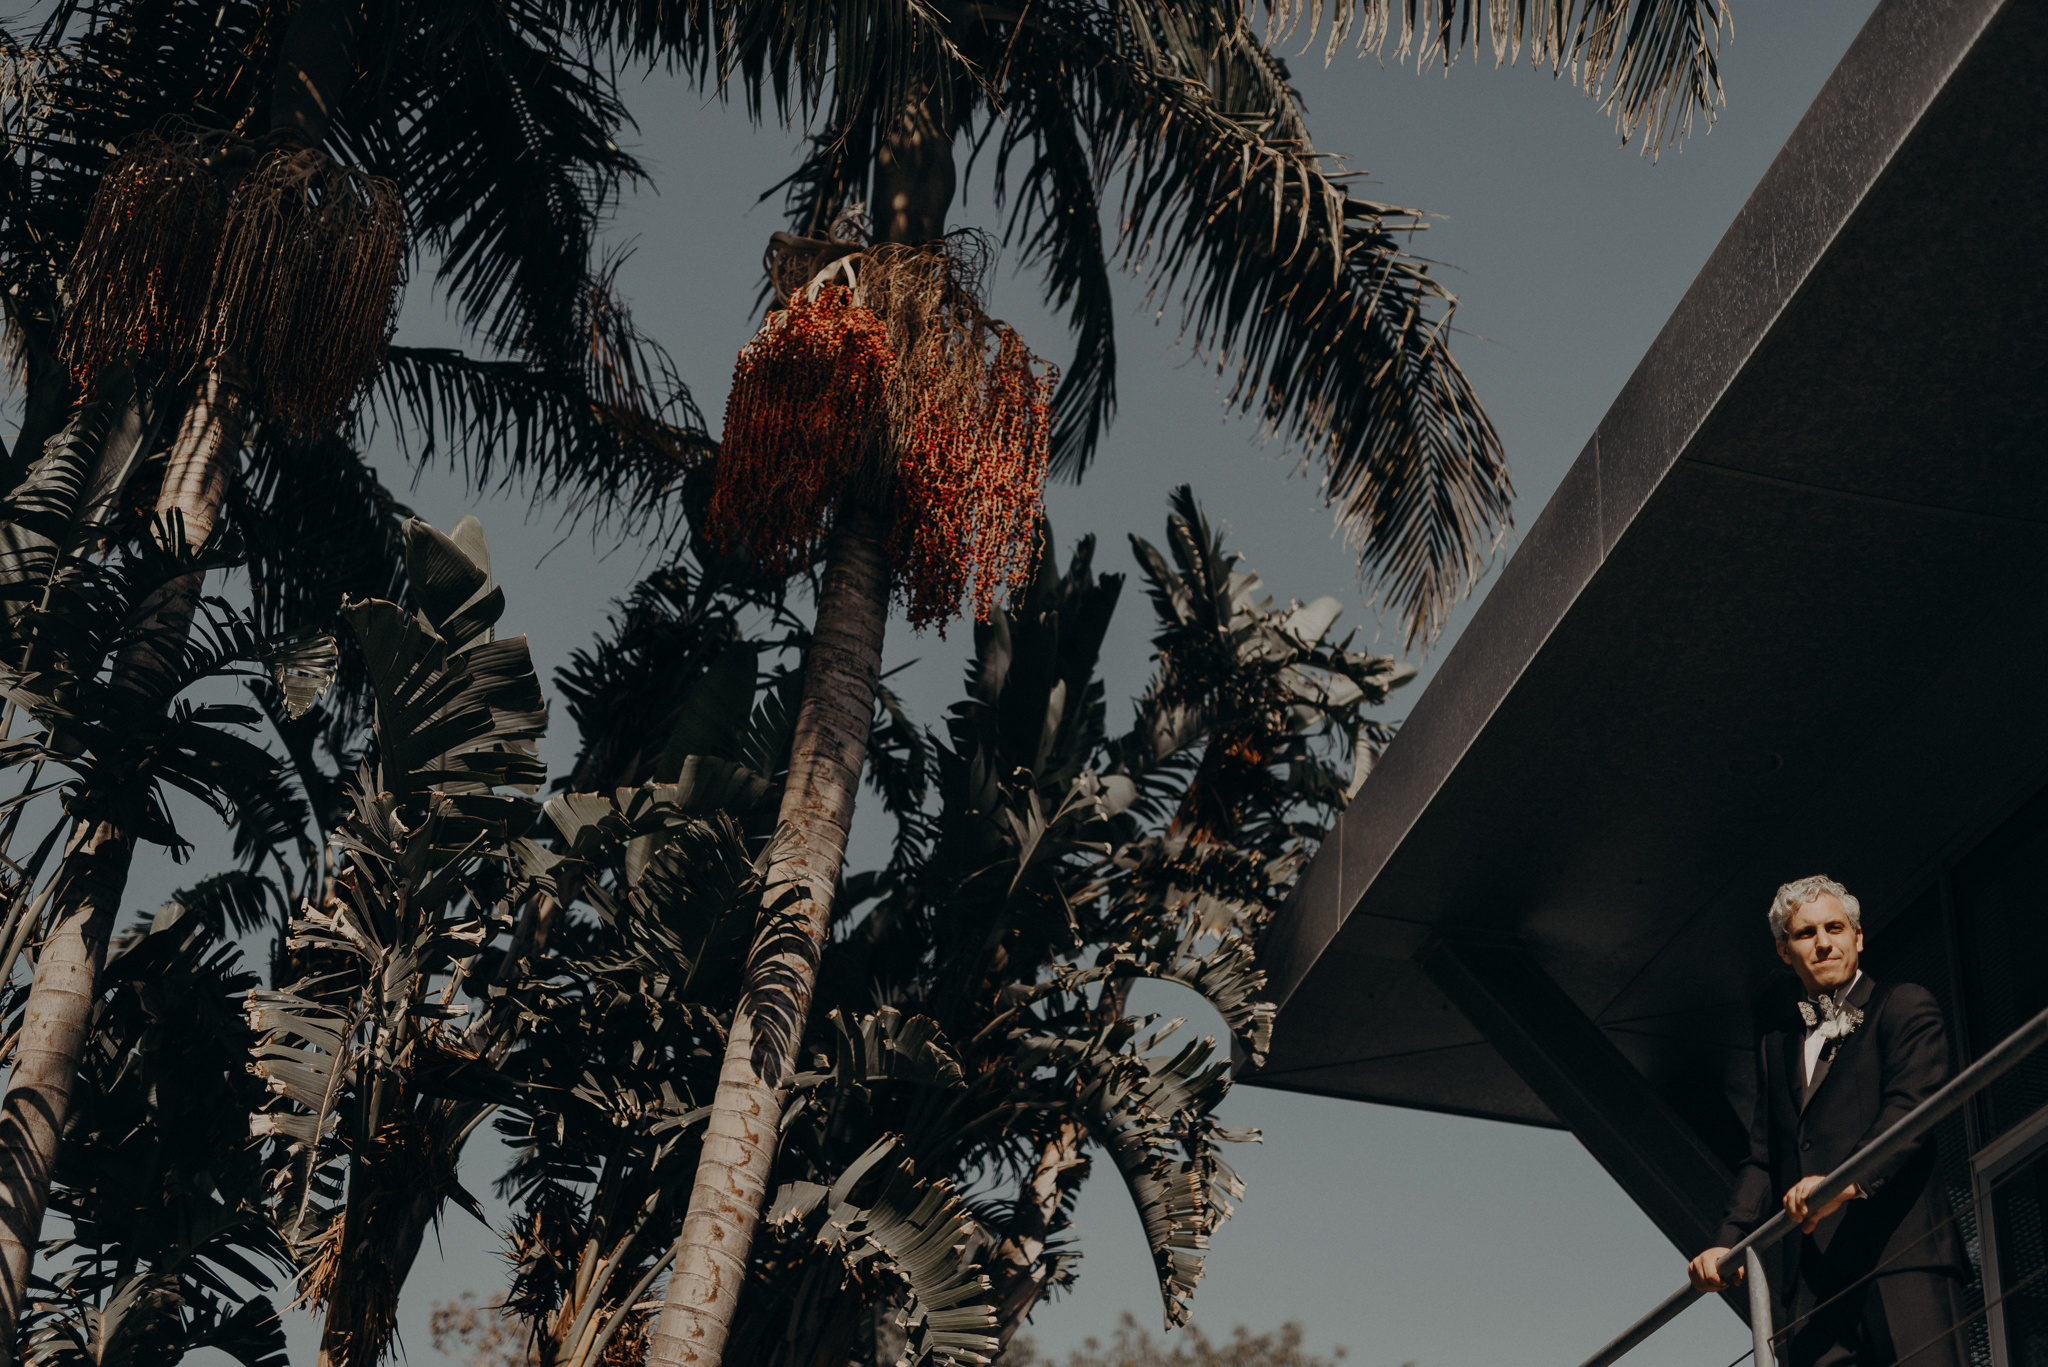 Isaiah + Taylor Photography - Private Estate Backyard Wedding - Beverly Hills - Los Angeles Wedding Photographer - 11.jpg